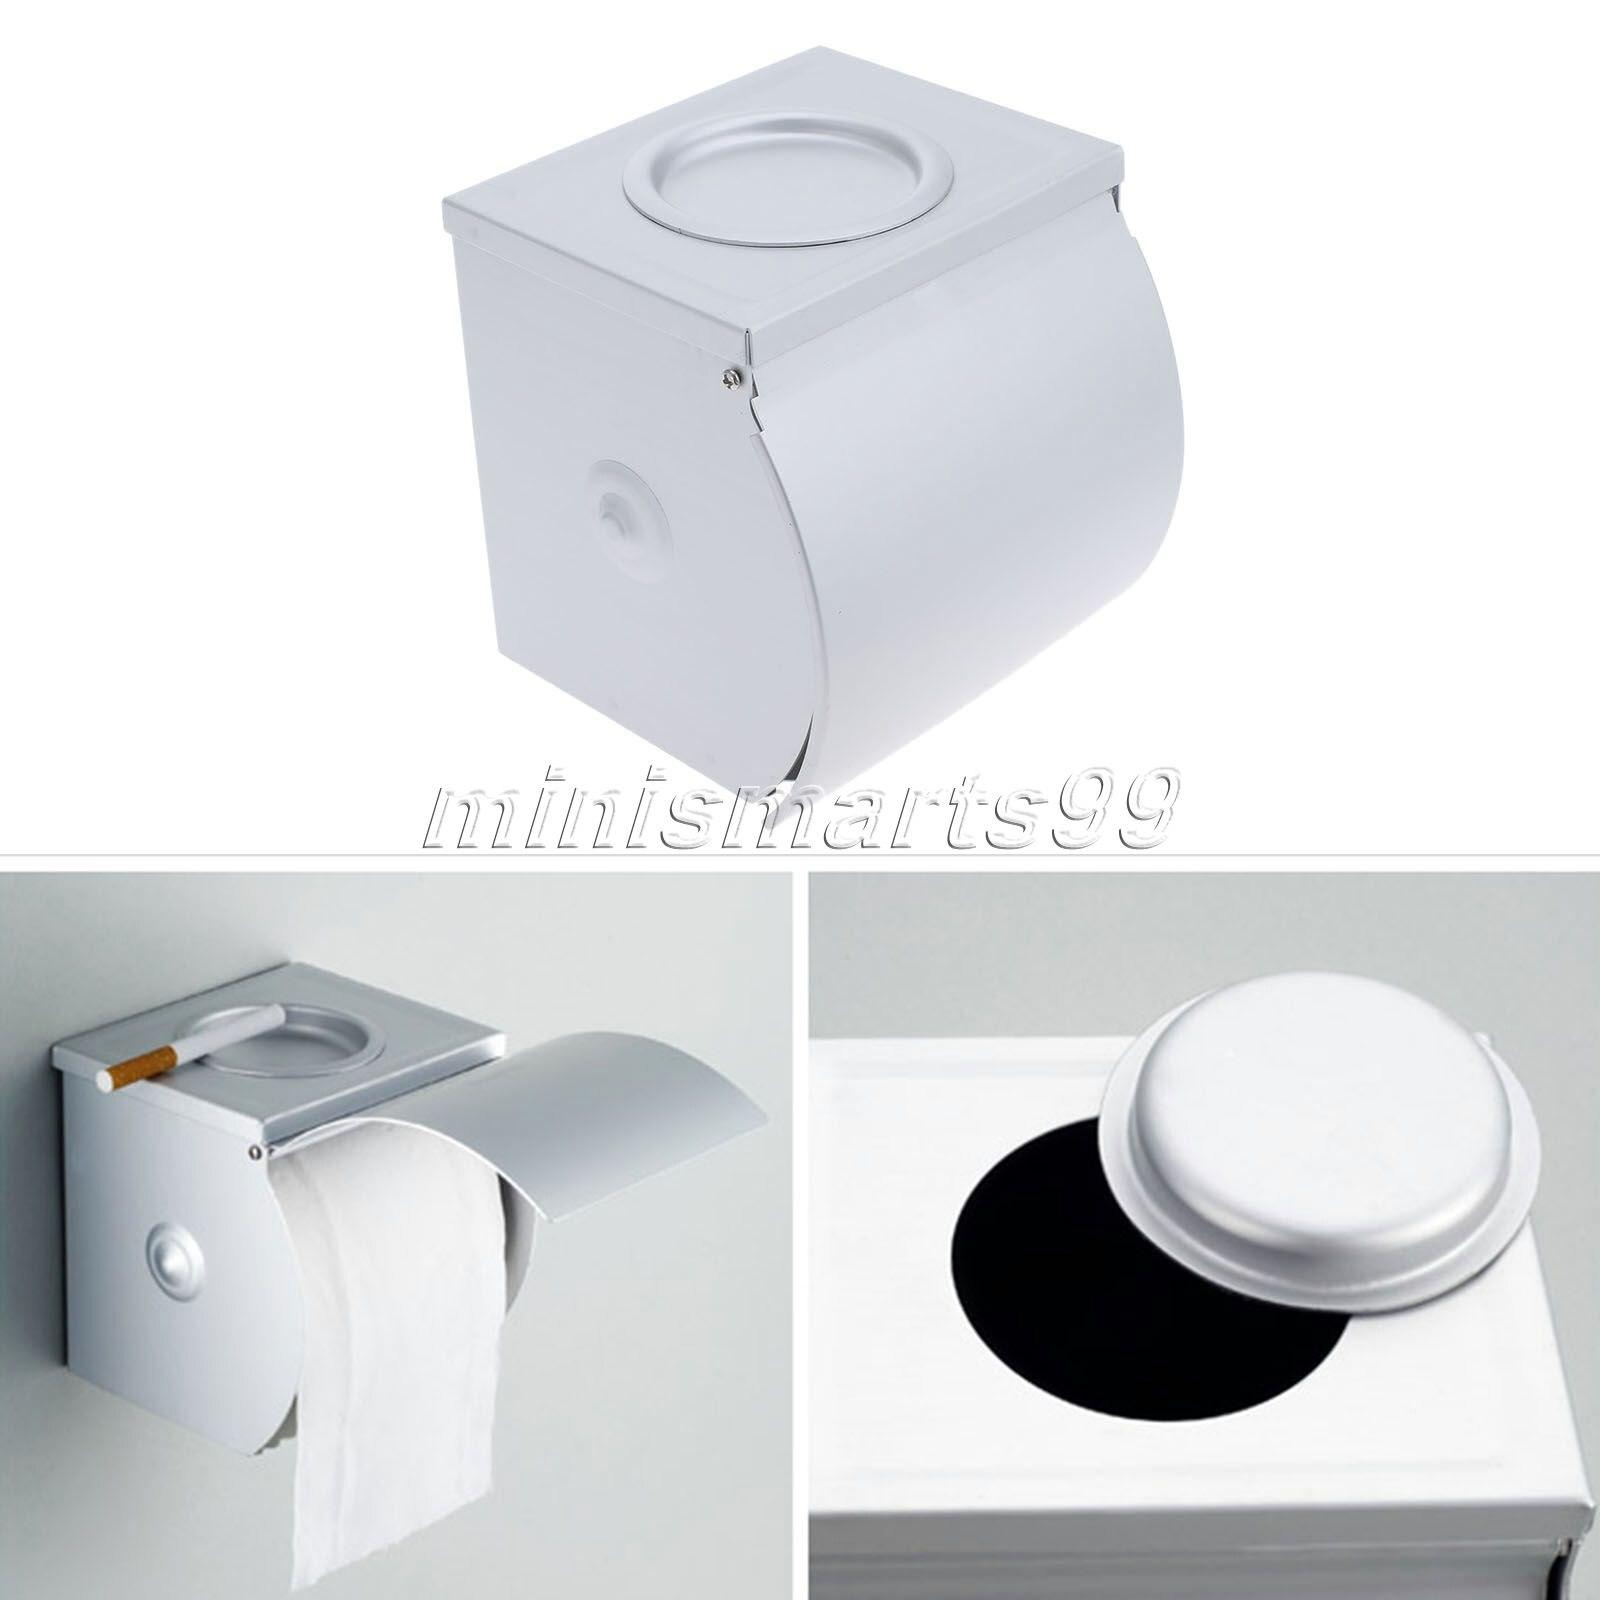 online get cheap modern shelf paper aliexpresscom  alibaba group - modern bathroom toilet paper holder tissue holder roll paper holder boxwall mounted aluminum paper dispenser